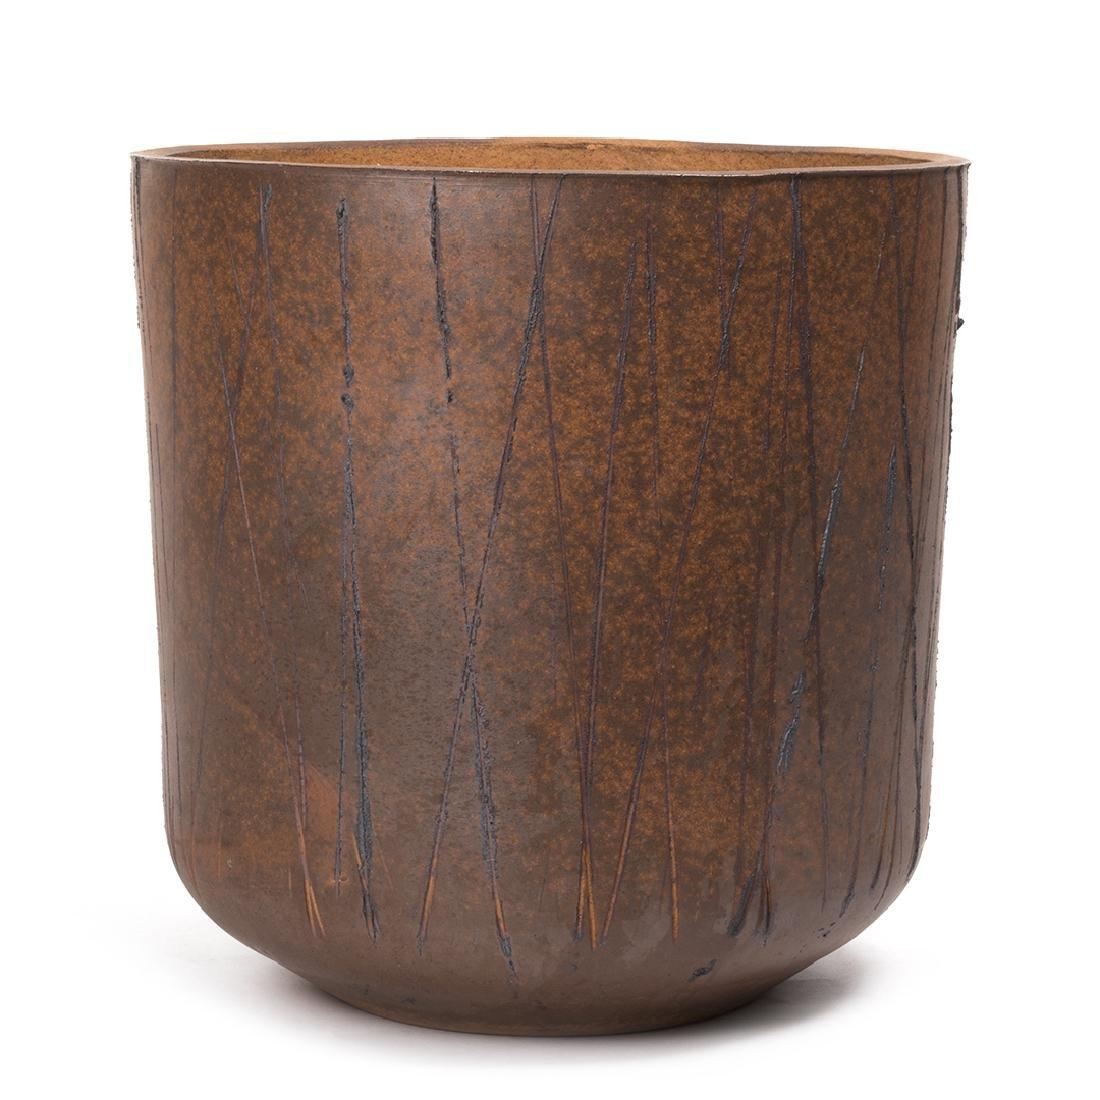 David Cressey Stoneware Planter